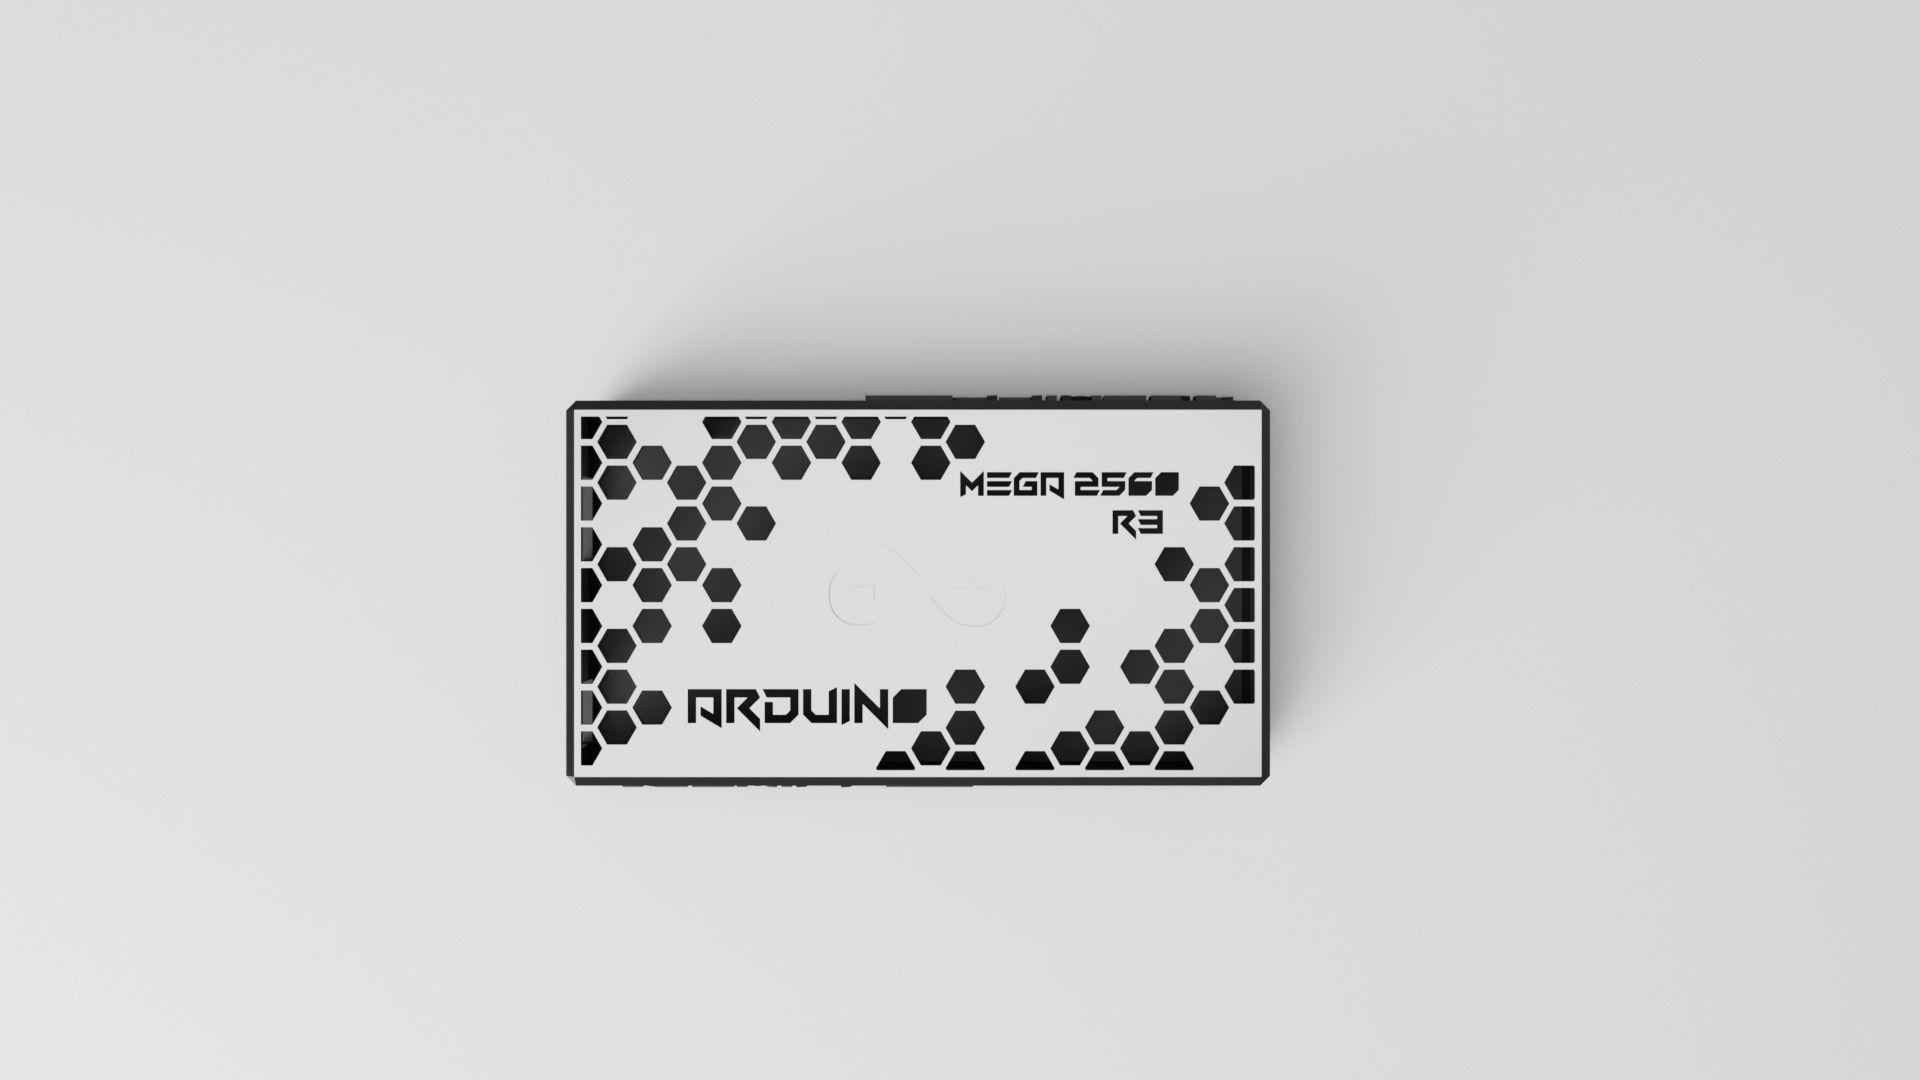 Arduino Mega 2560 R3 Case|Autodesk Online Gallery